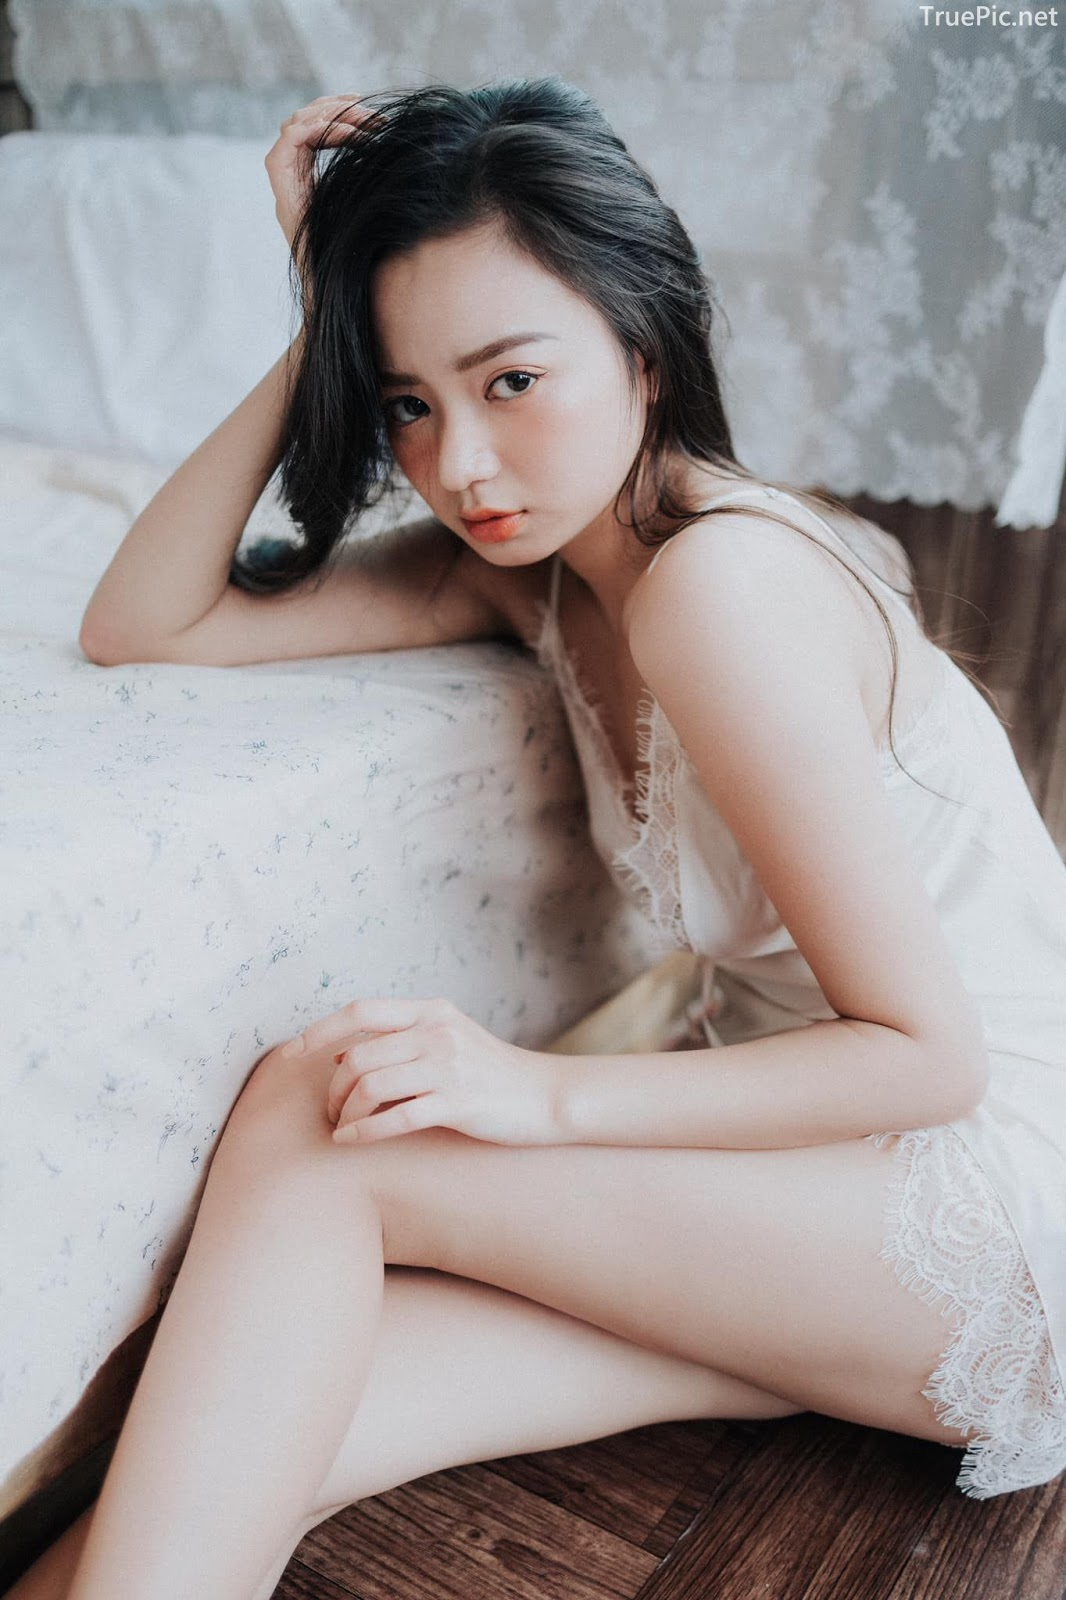 Vietnamese Sexy Model - Vu Ngoc Kim Chi - Beautiful in white - TruePic.net- Picture 24